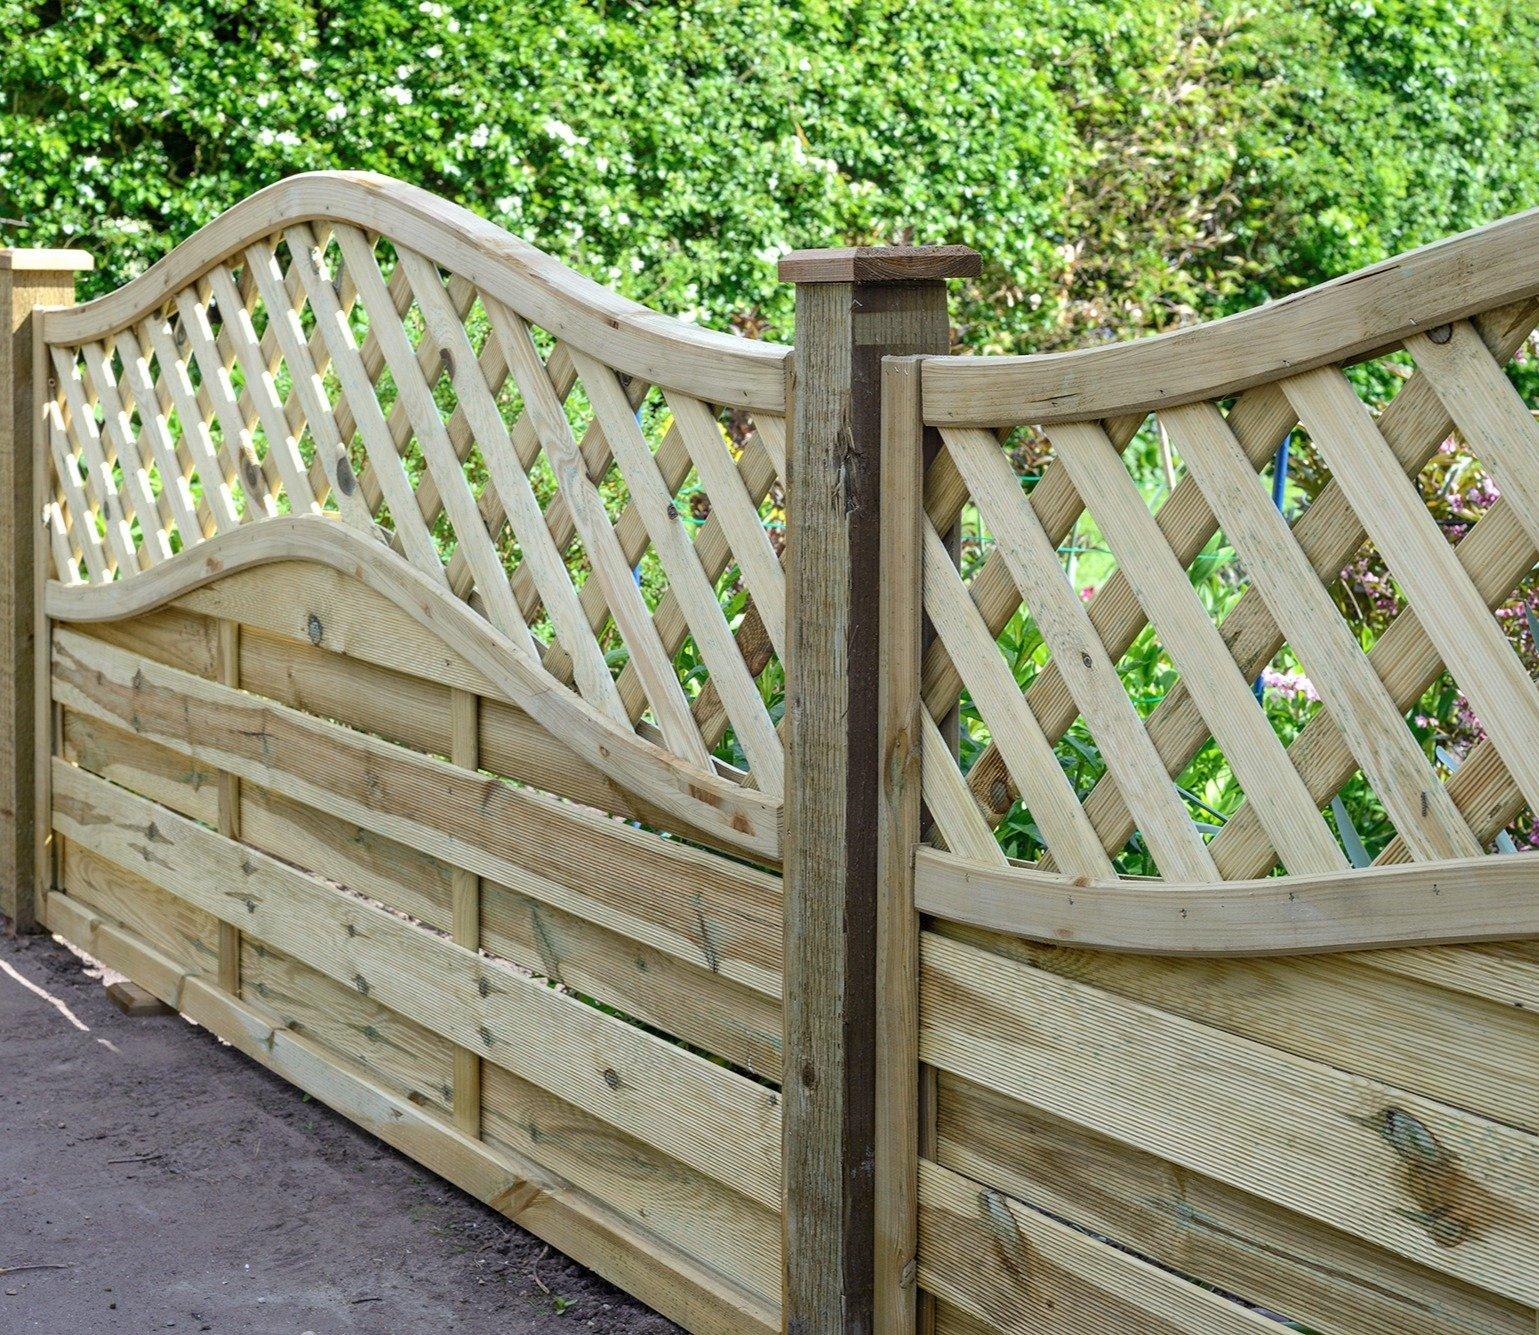 Grange Elite St Meloir 6ft X 3ft Fence Panel Gardensitecouk within dimensions 1539 X 1335